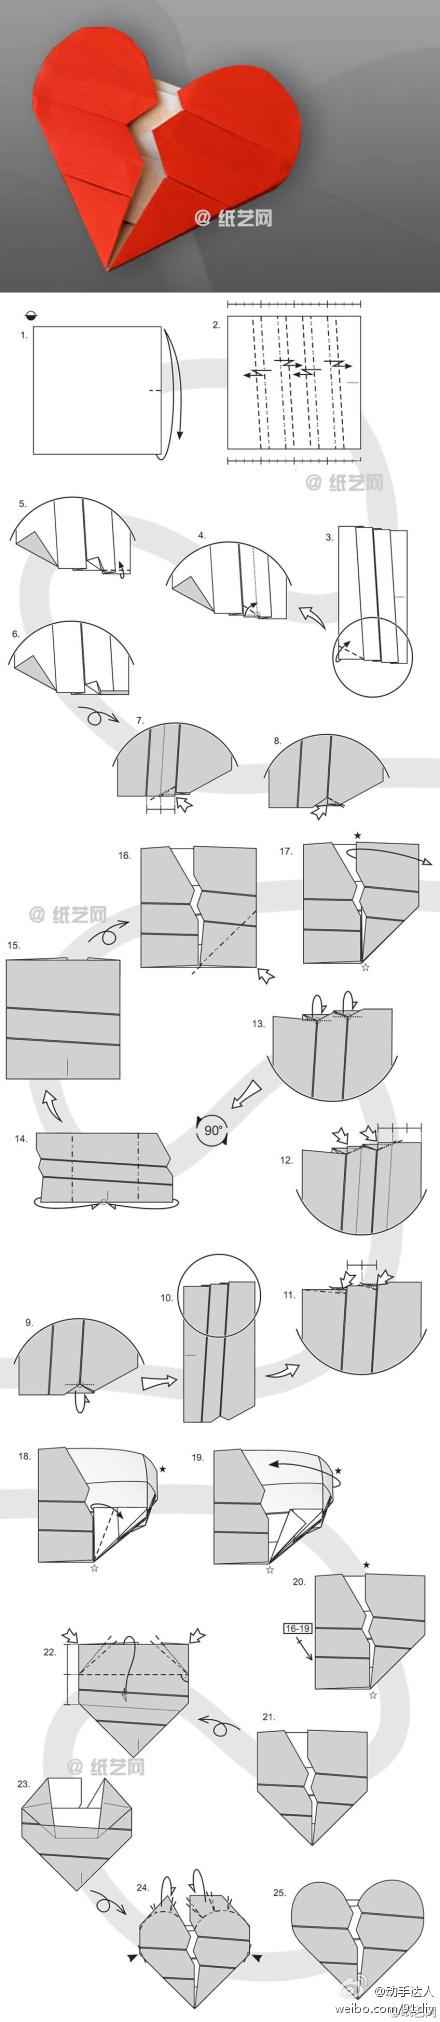 Origami Paper Broken Heart Instructions Pinterest Flowers Diagrams